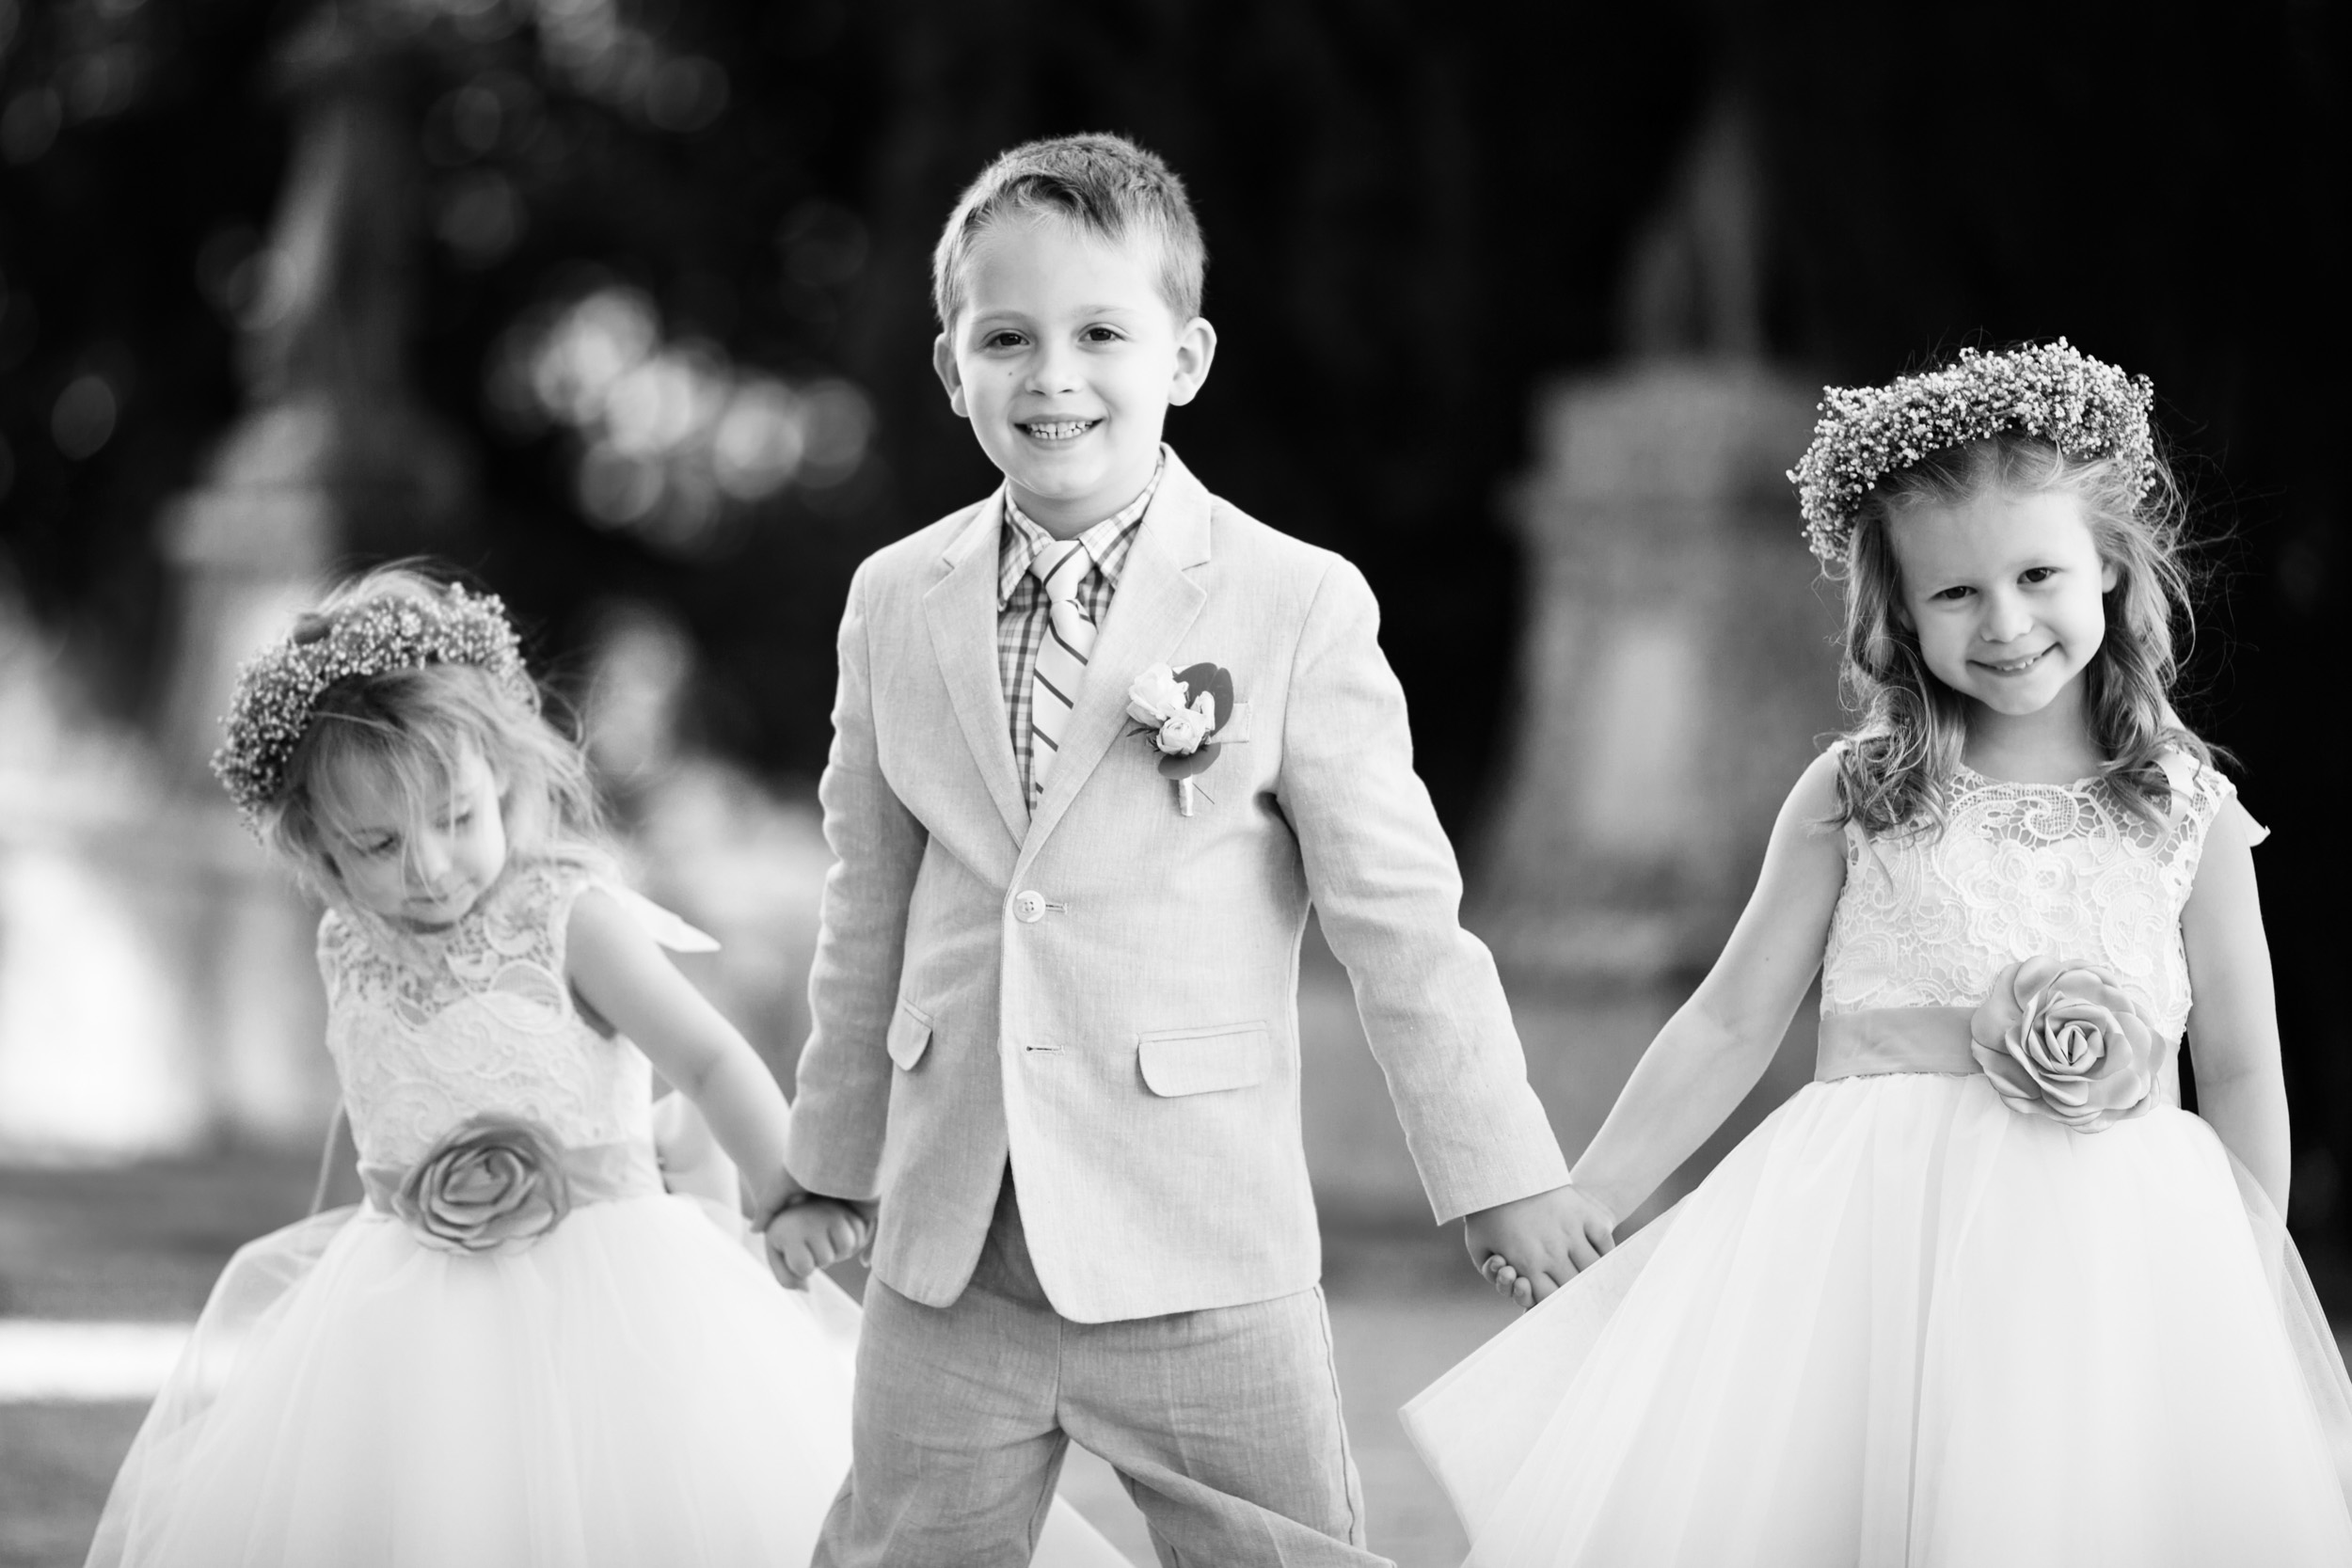 villa-gamberaia-florence-italy-destination-wedding-33.jpg